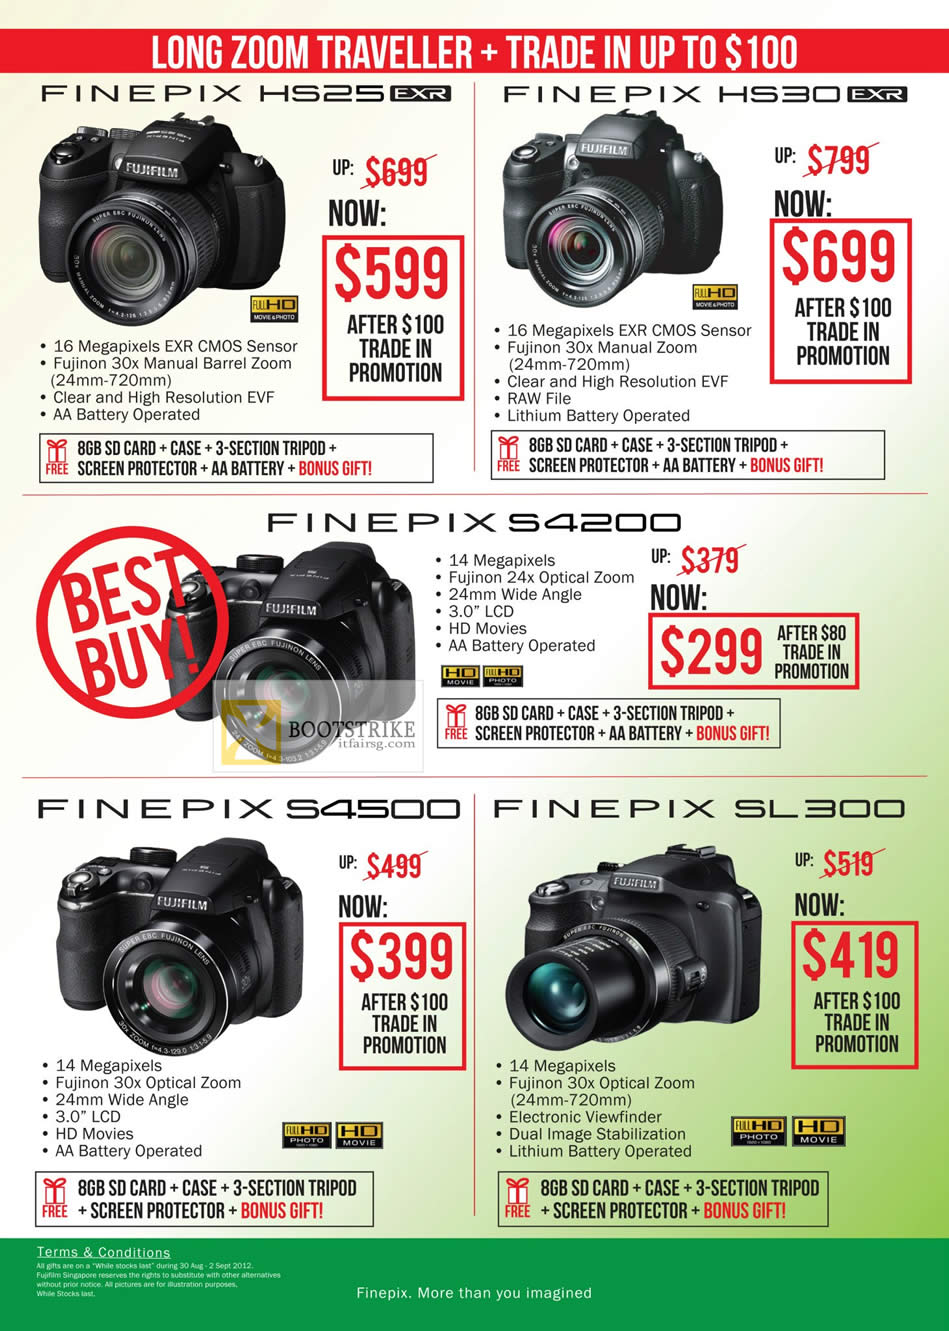 COMEX 2012 price list image brochure of Fujifilm Digital Cameras Finepix HS25, HS30, S4200, S4500, SL300